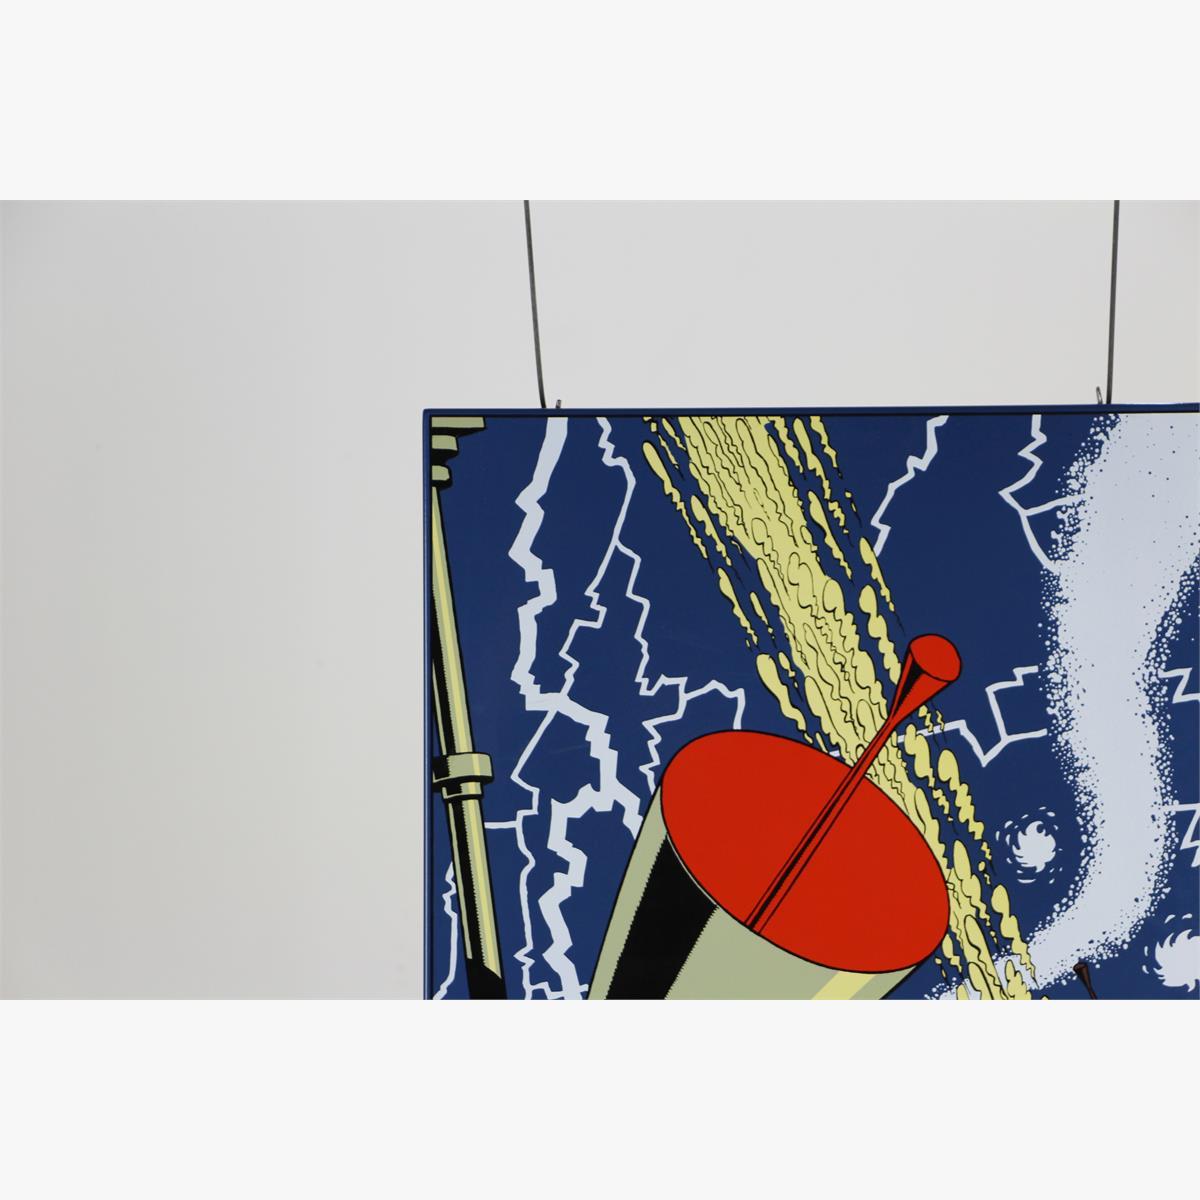 "Afbeeldingen van emaille bord blake & mortimer "" s.o.s meteoren oplage 99 ex 2011 plaque emaillee s.o.s météores"